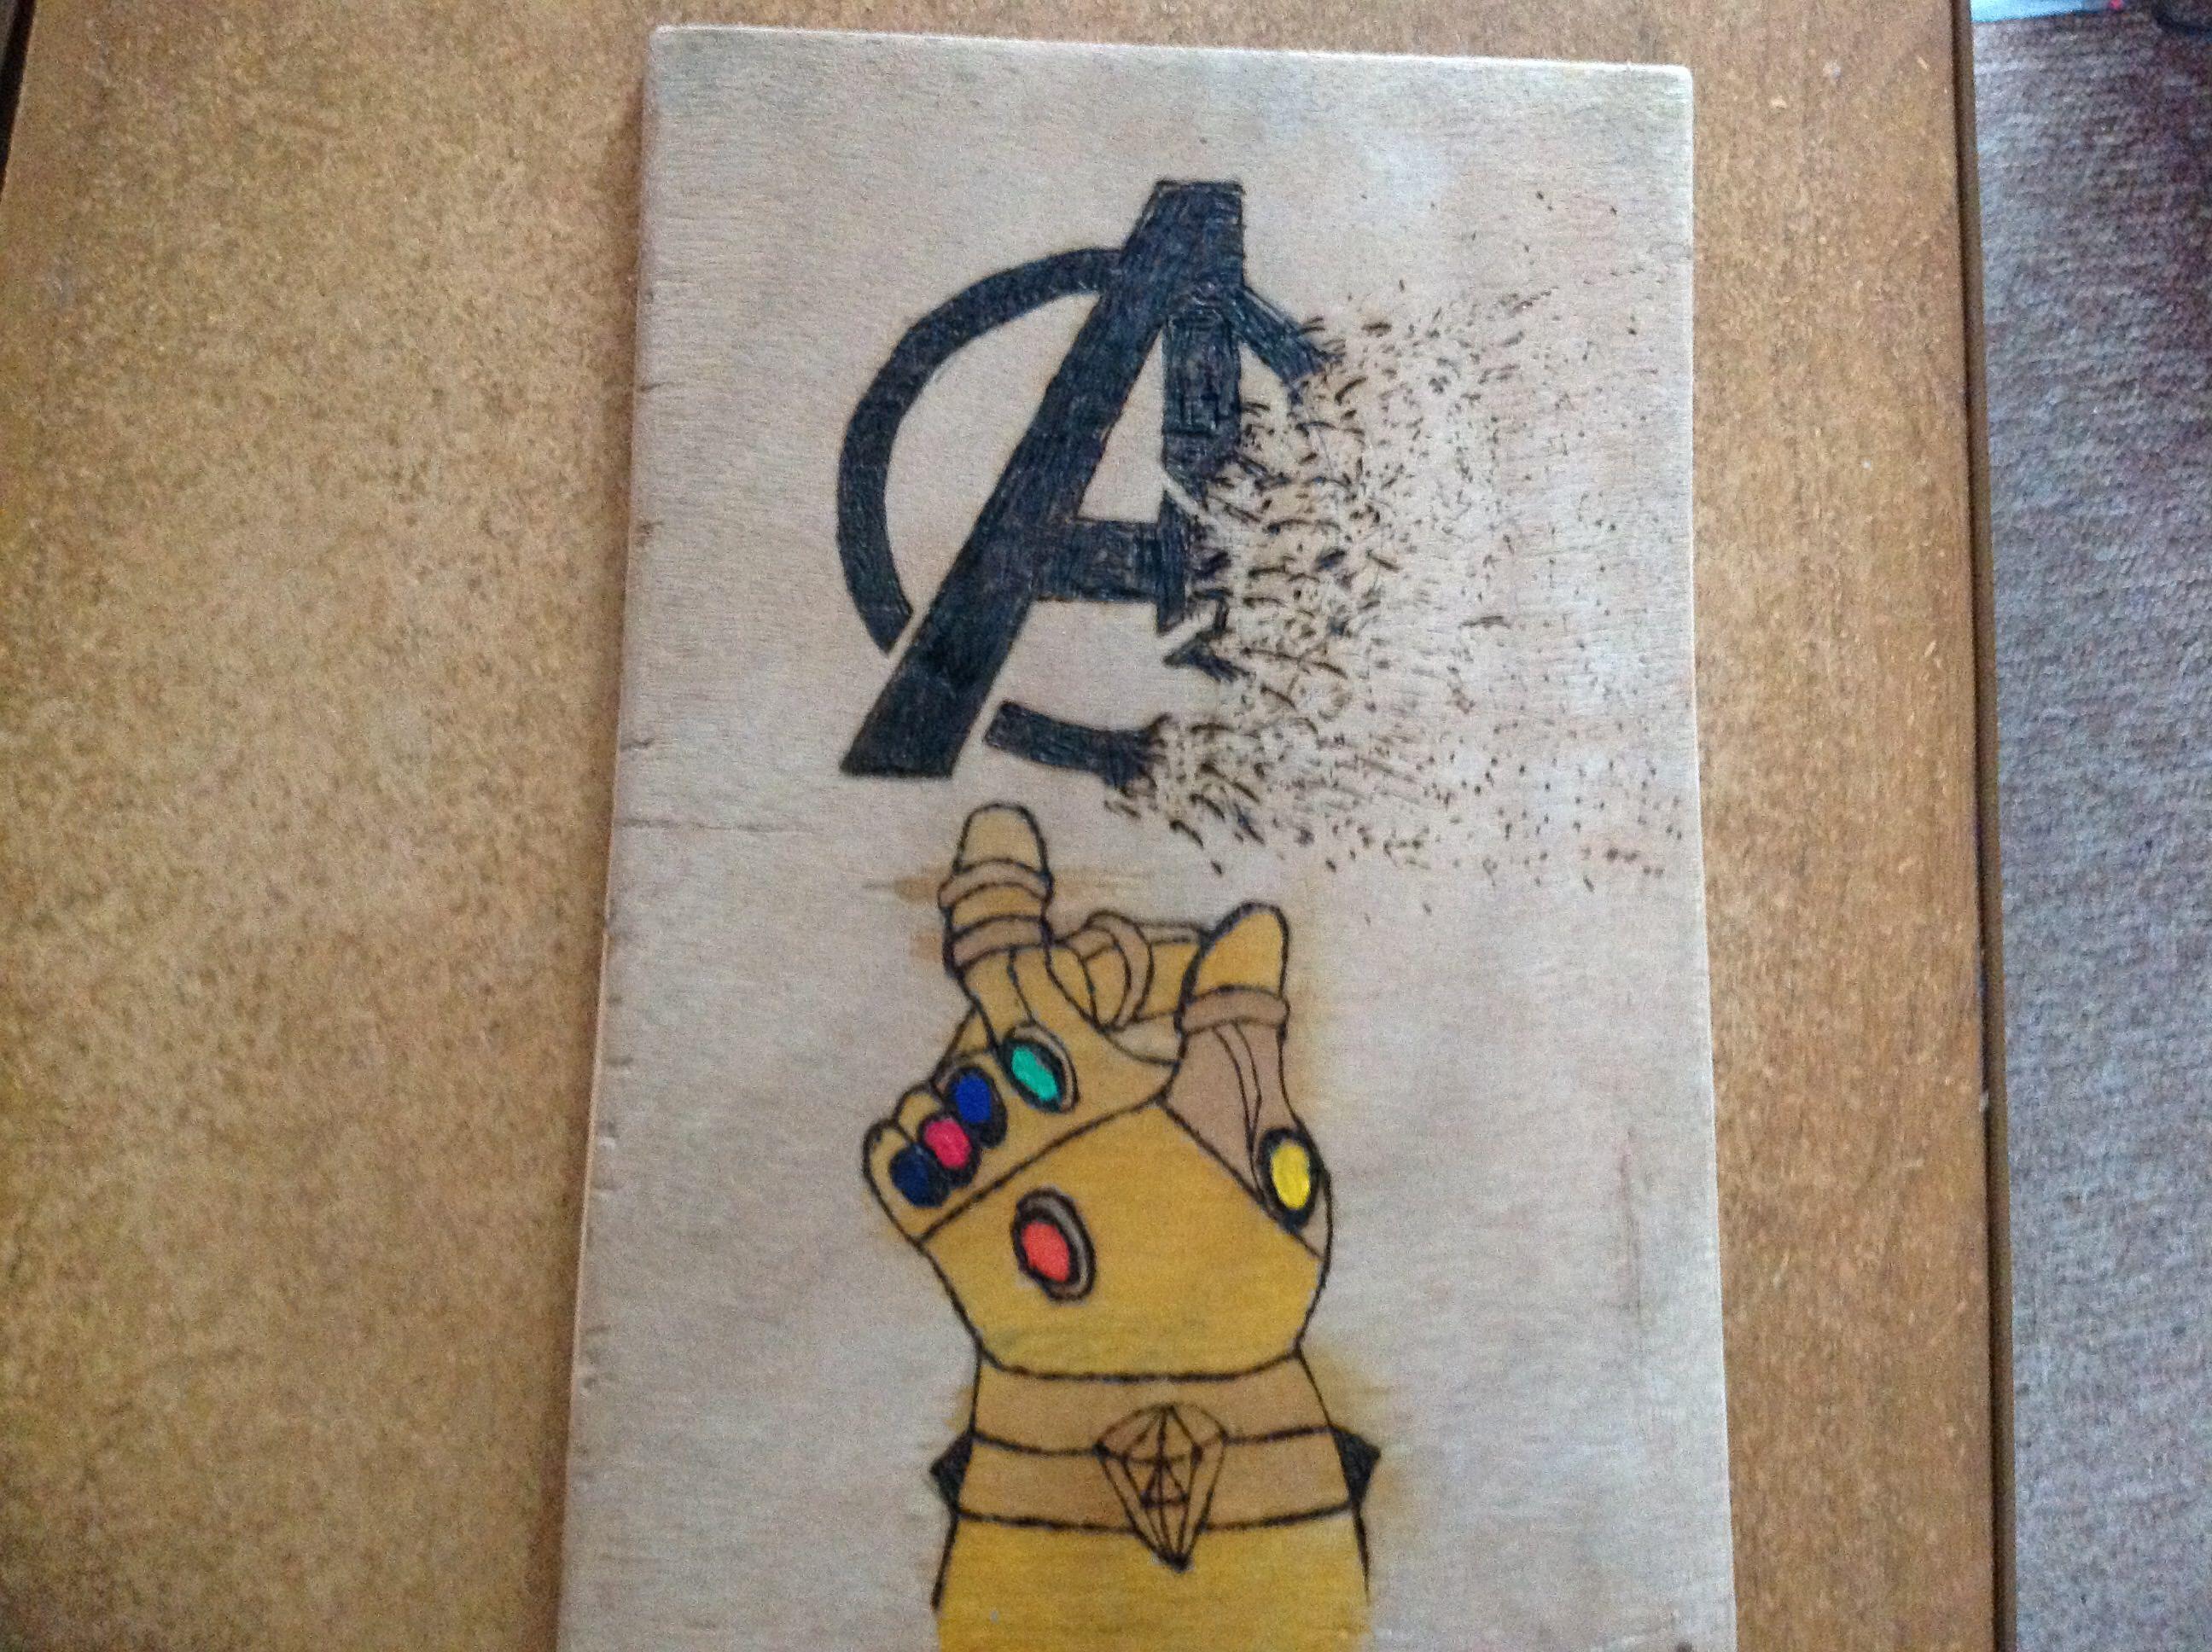 Avengers infinity war pyrography FanArt - View on Imgur